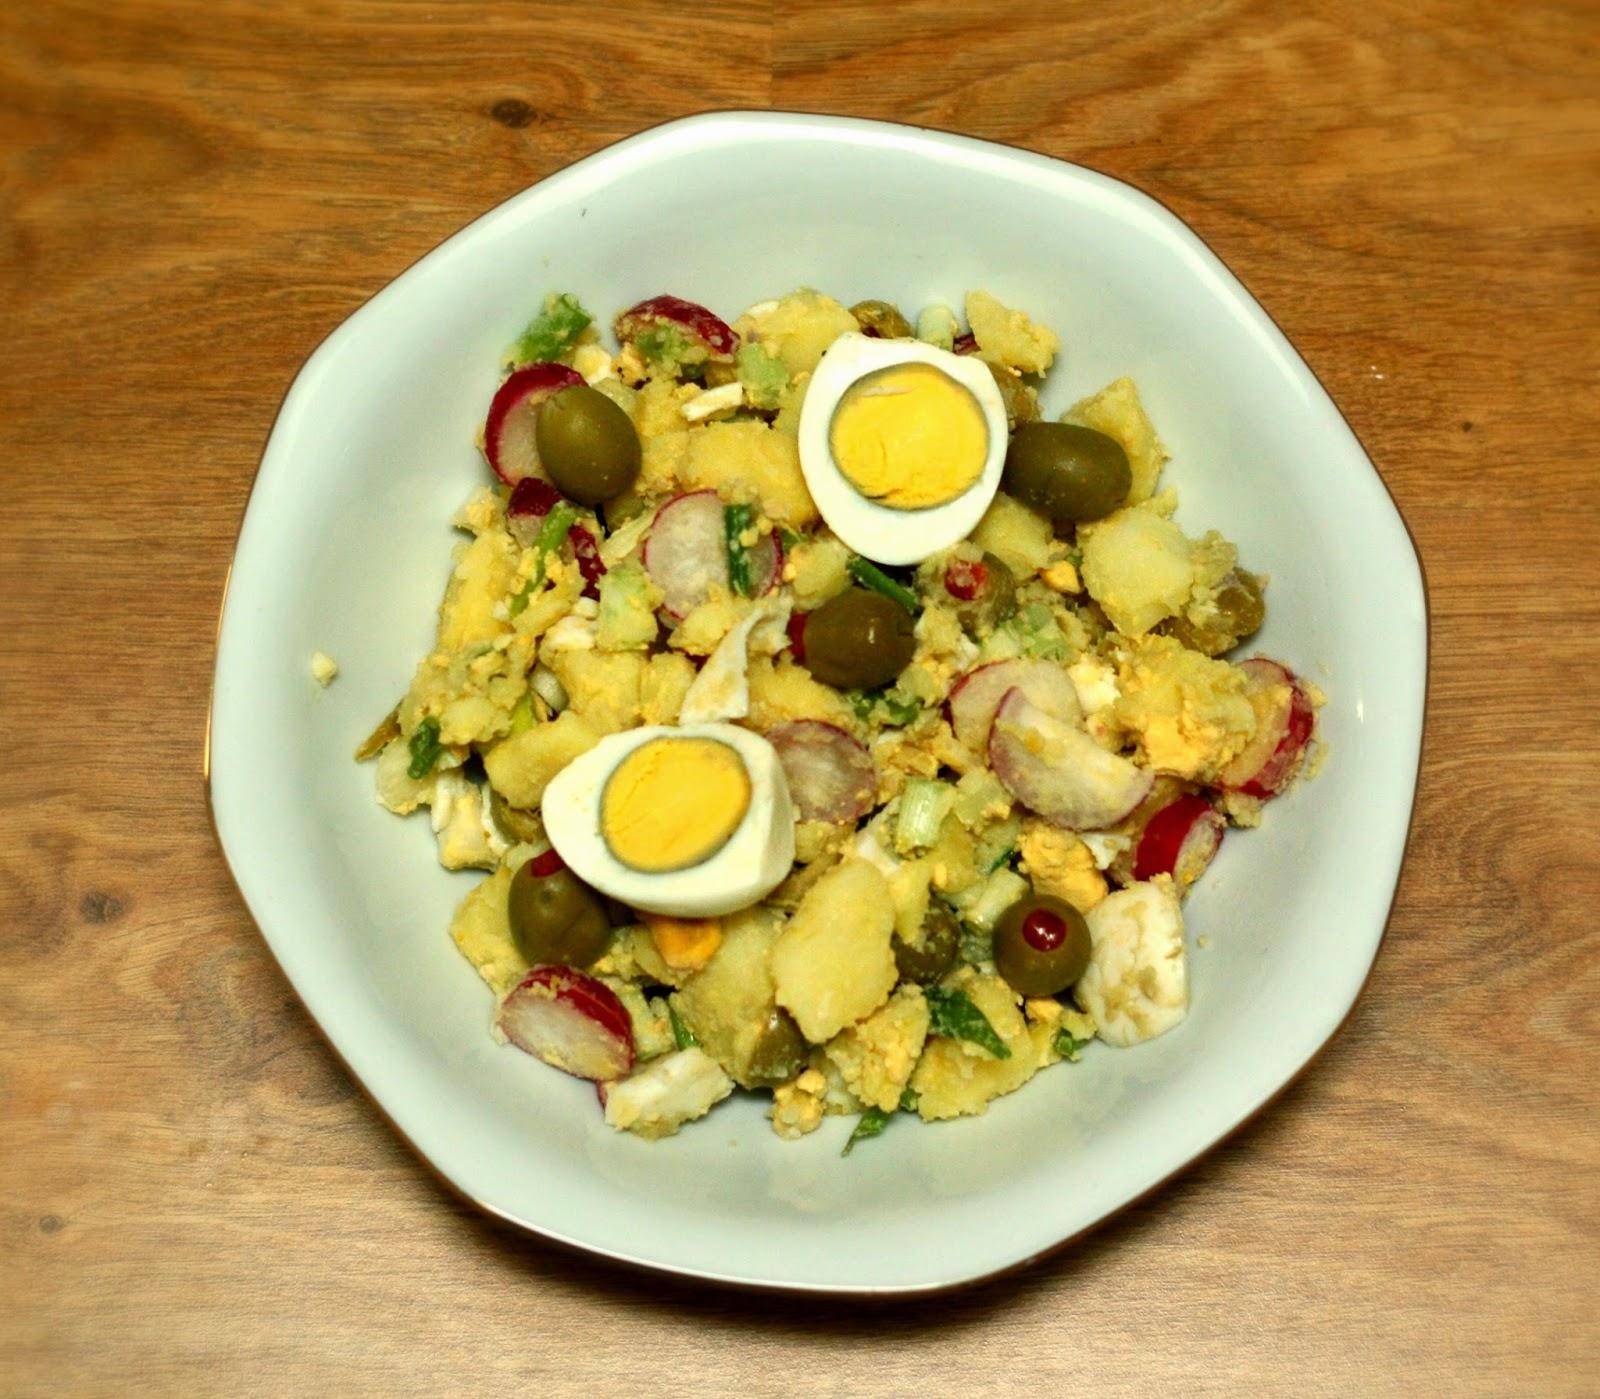 #Vegetarian Potato #Salad #Recipe